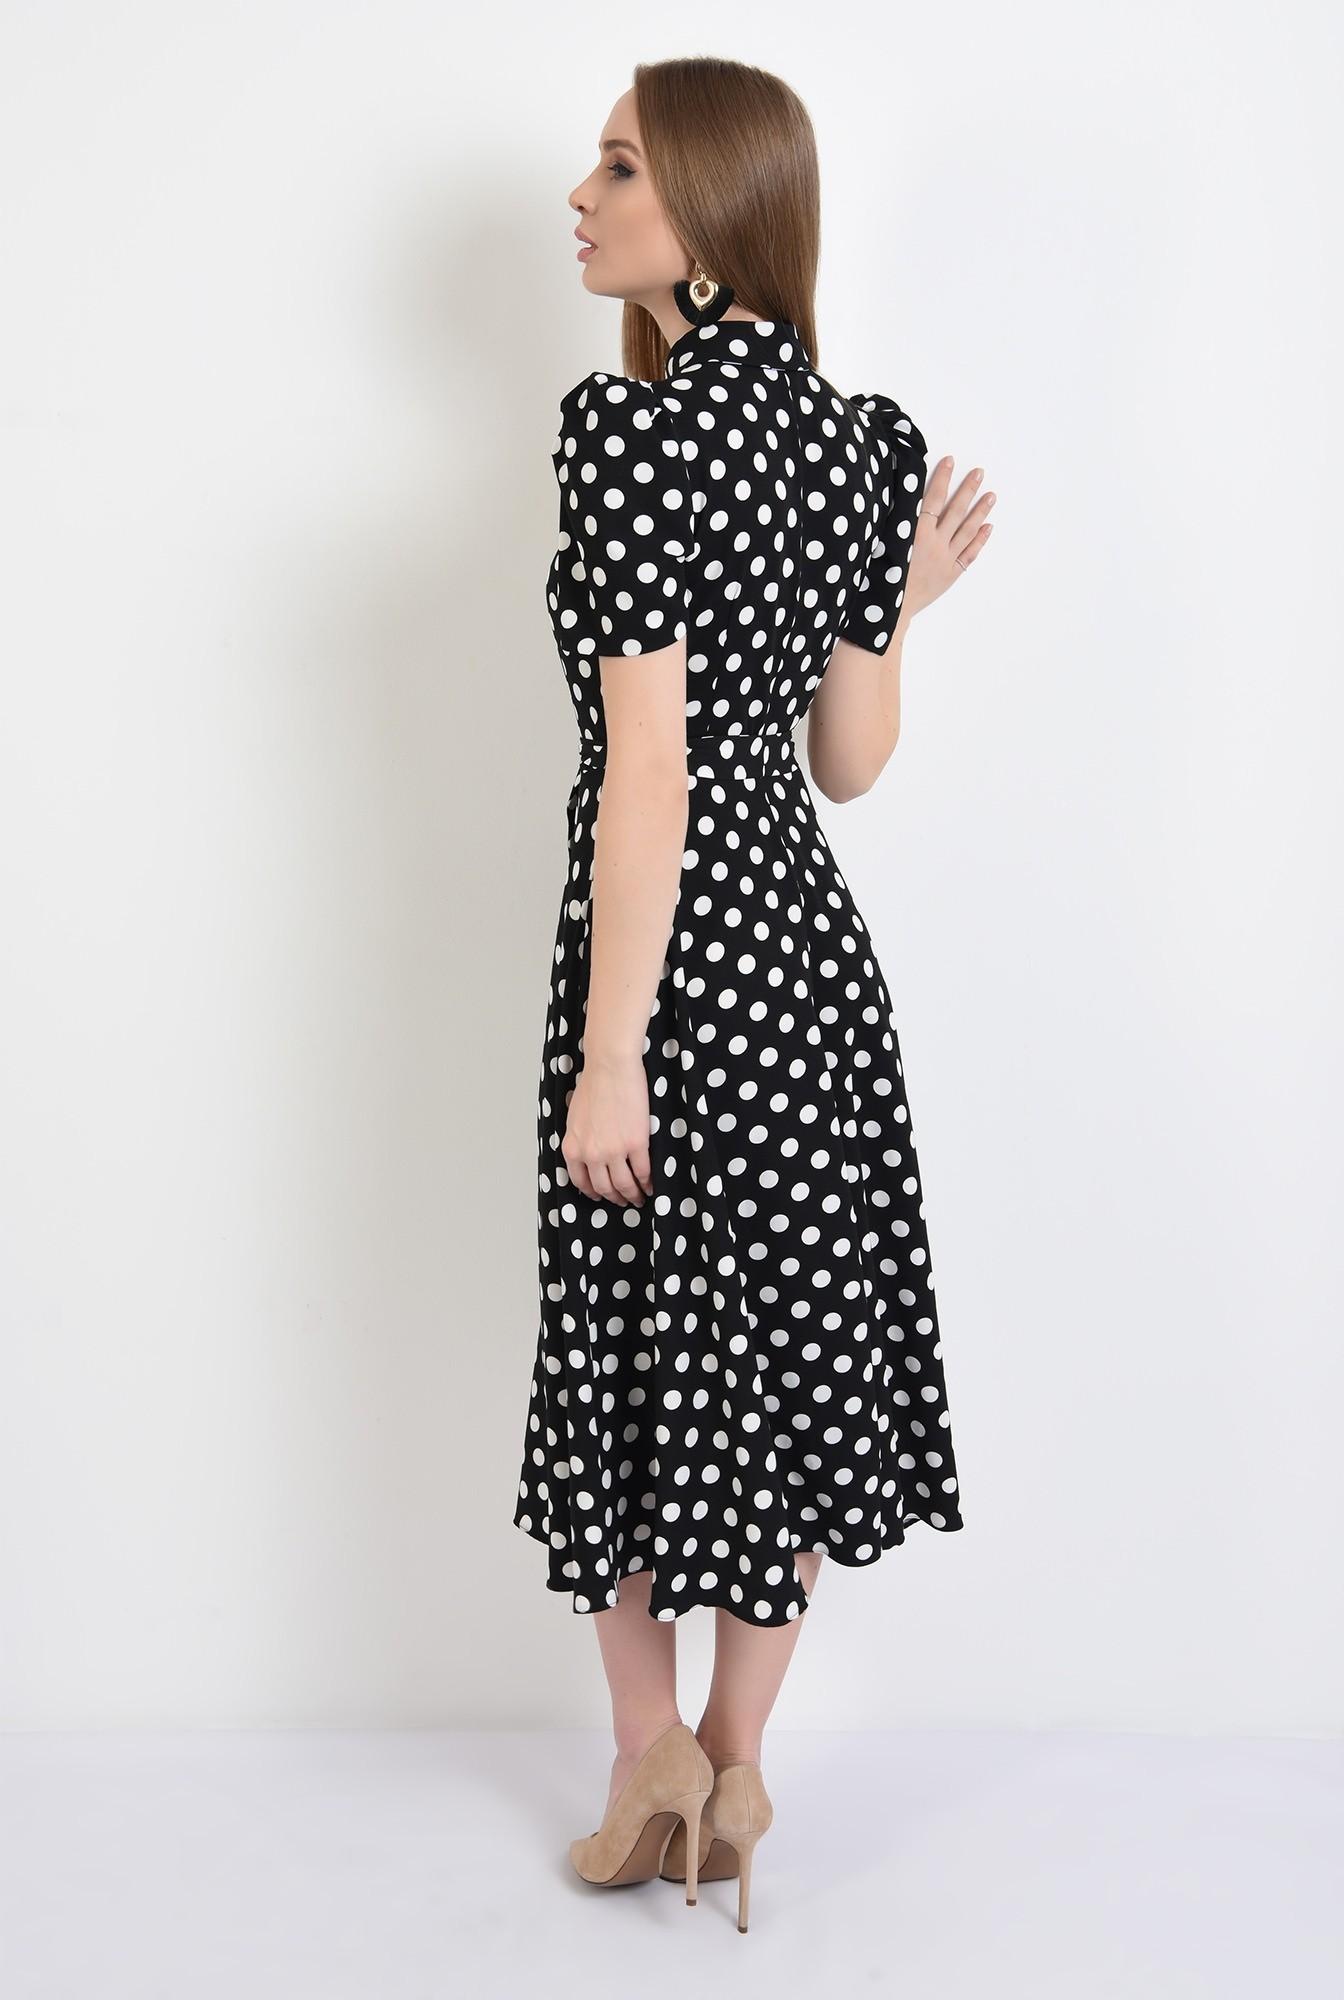 1 - rochie casual, evazata, cu nasturi, cu cordon, buline, Poema